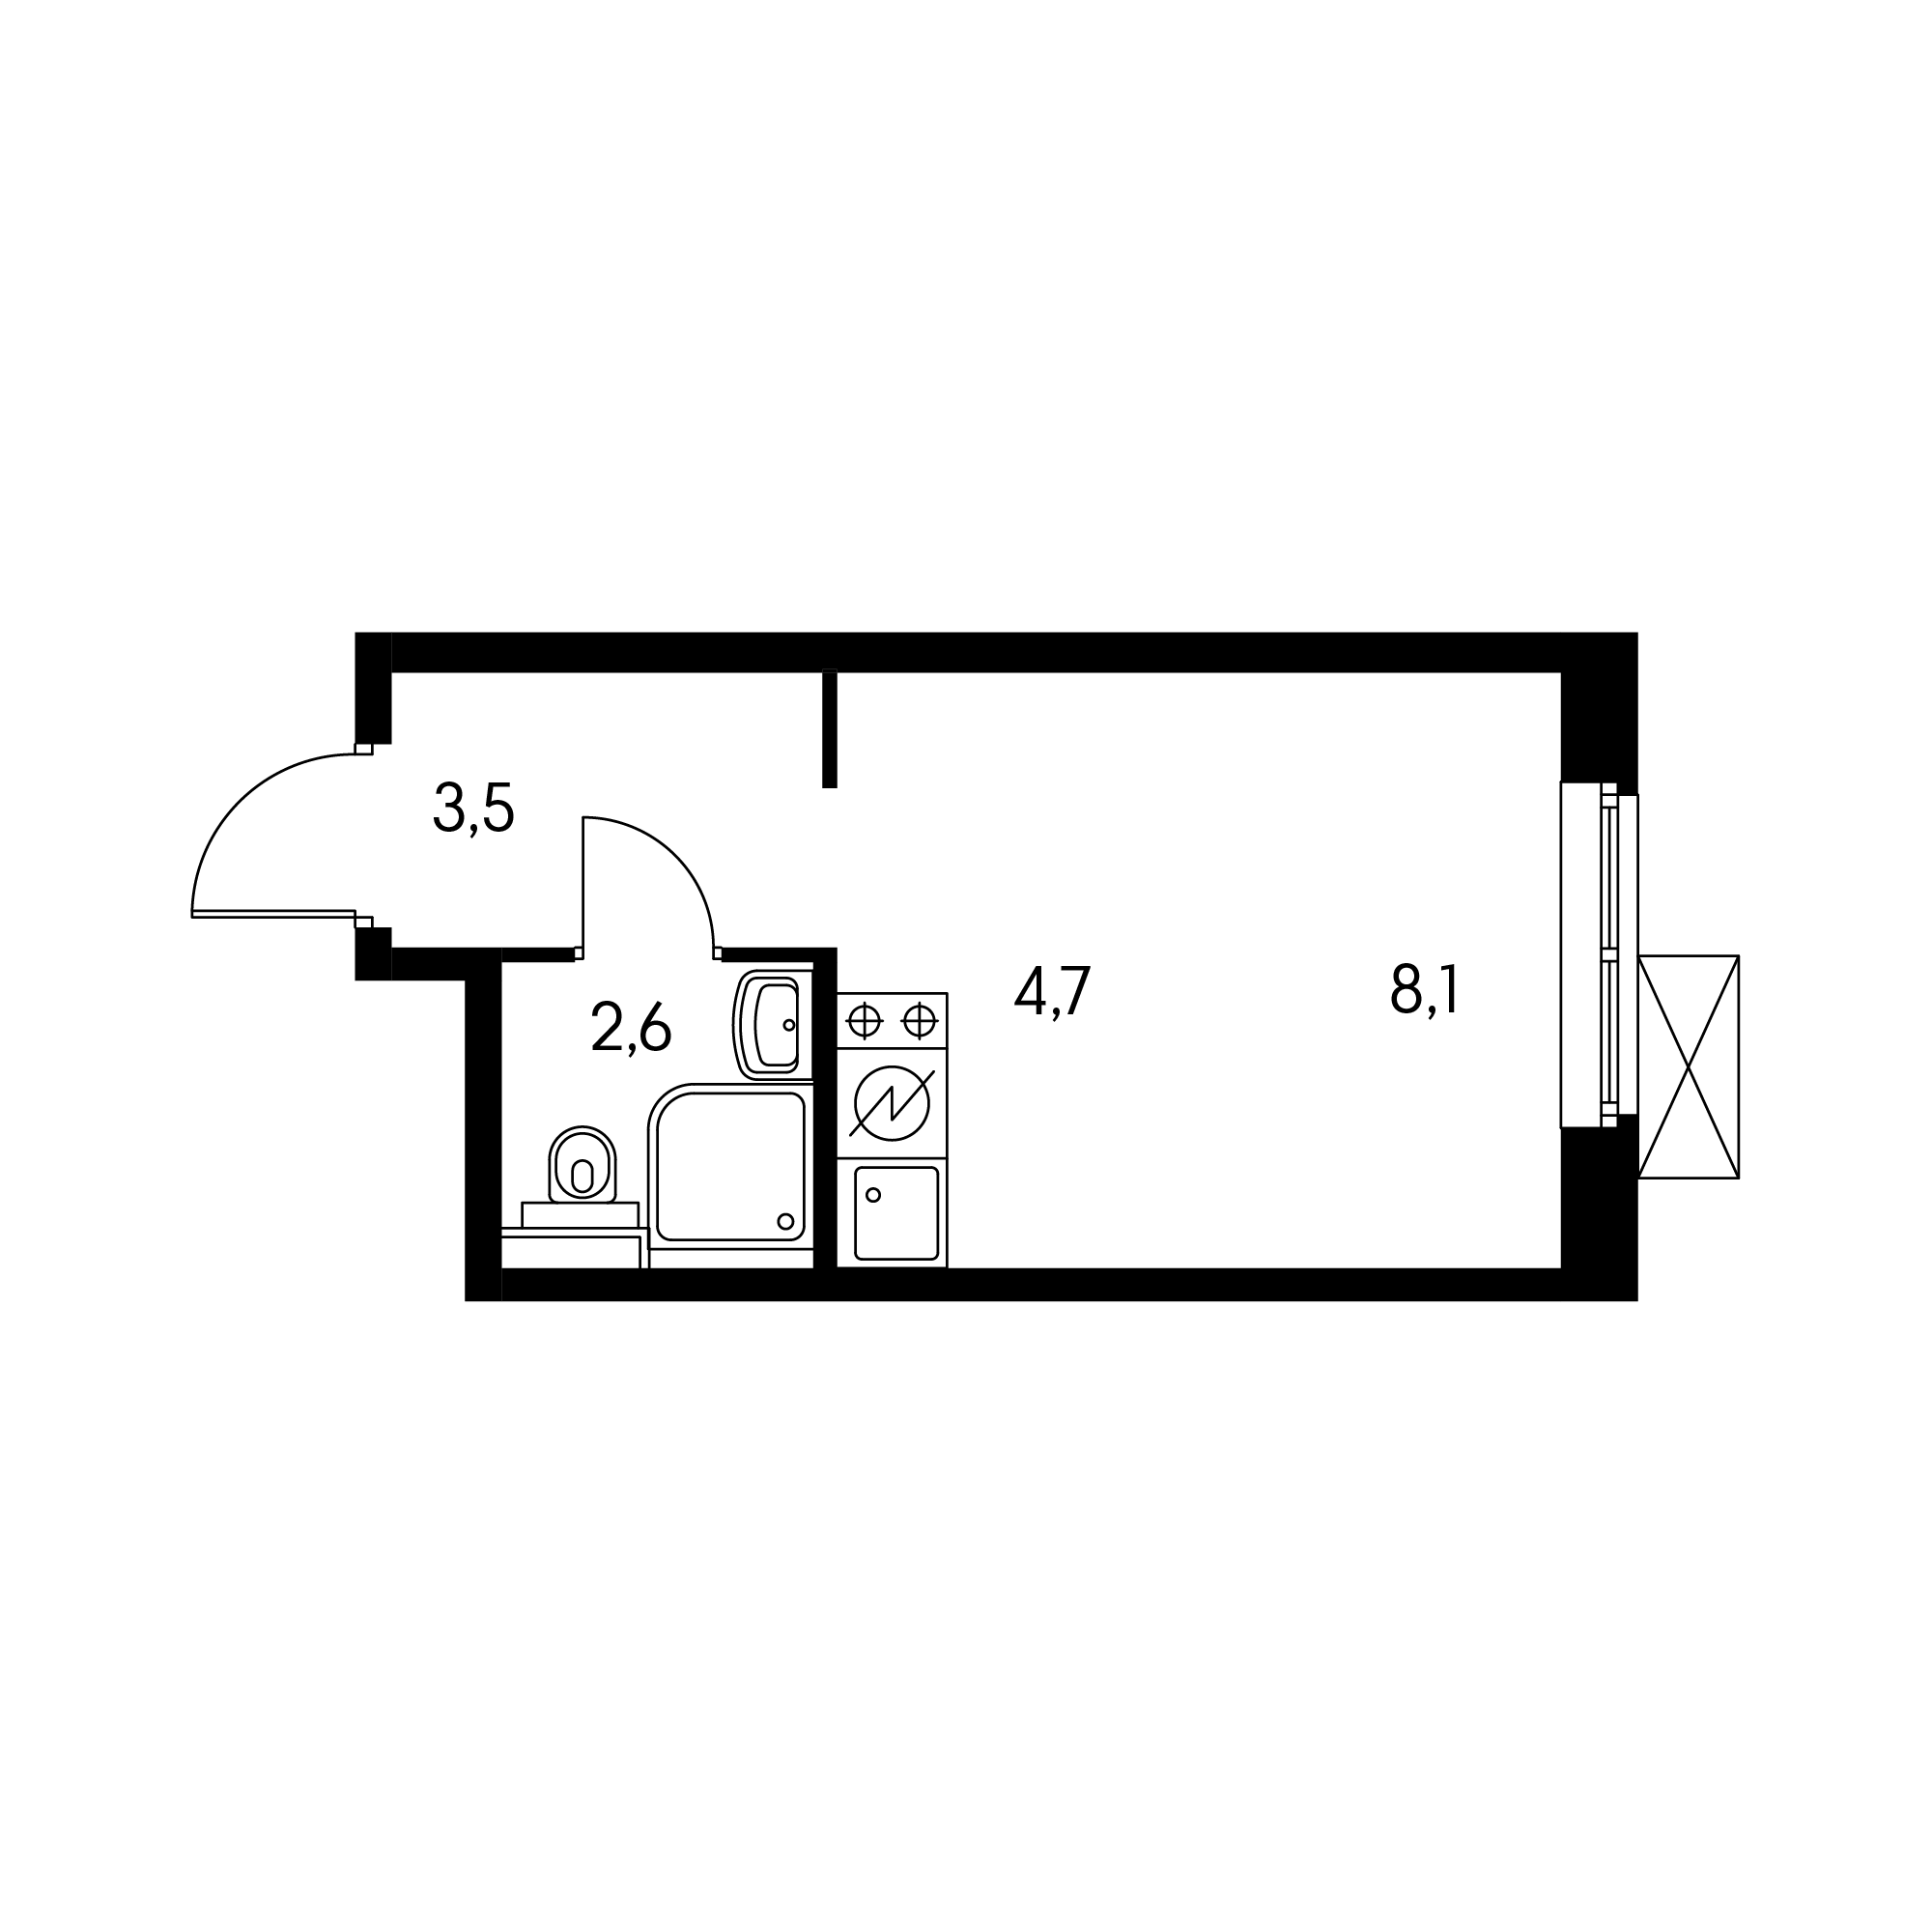 1NS2_3.45-1*